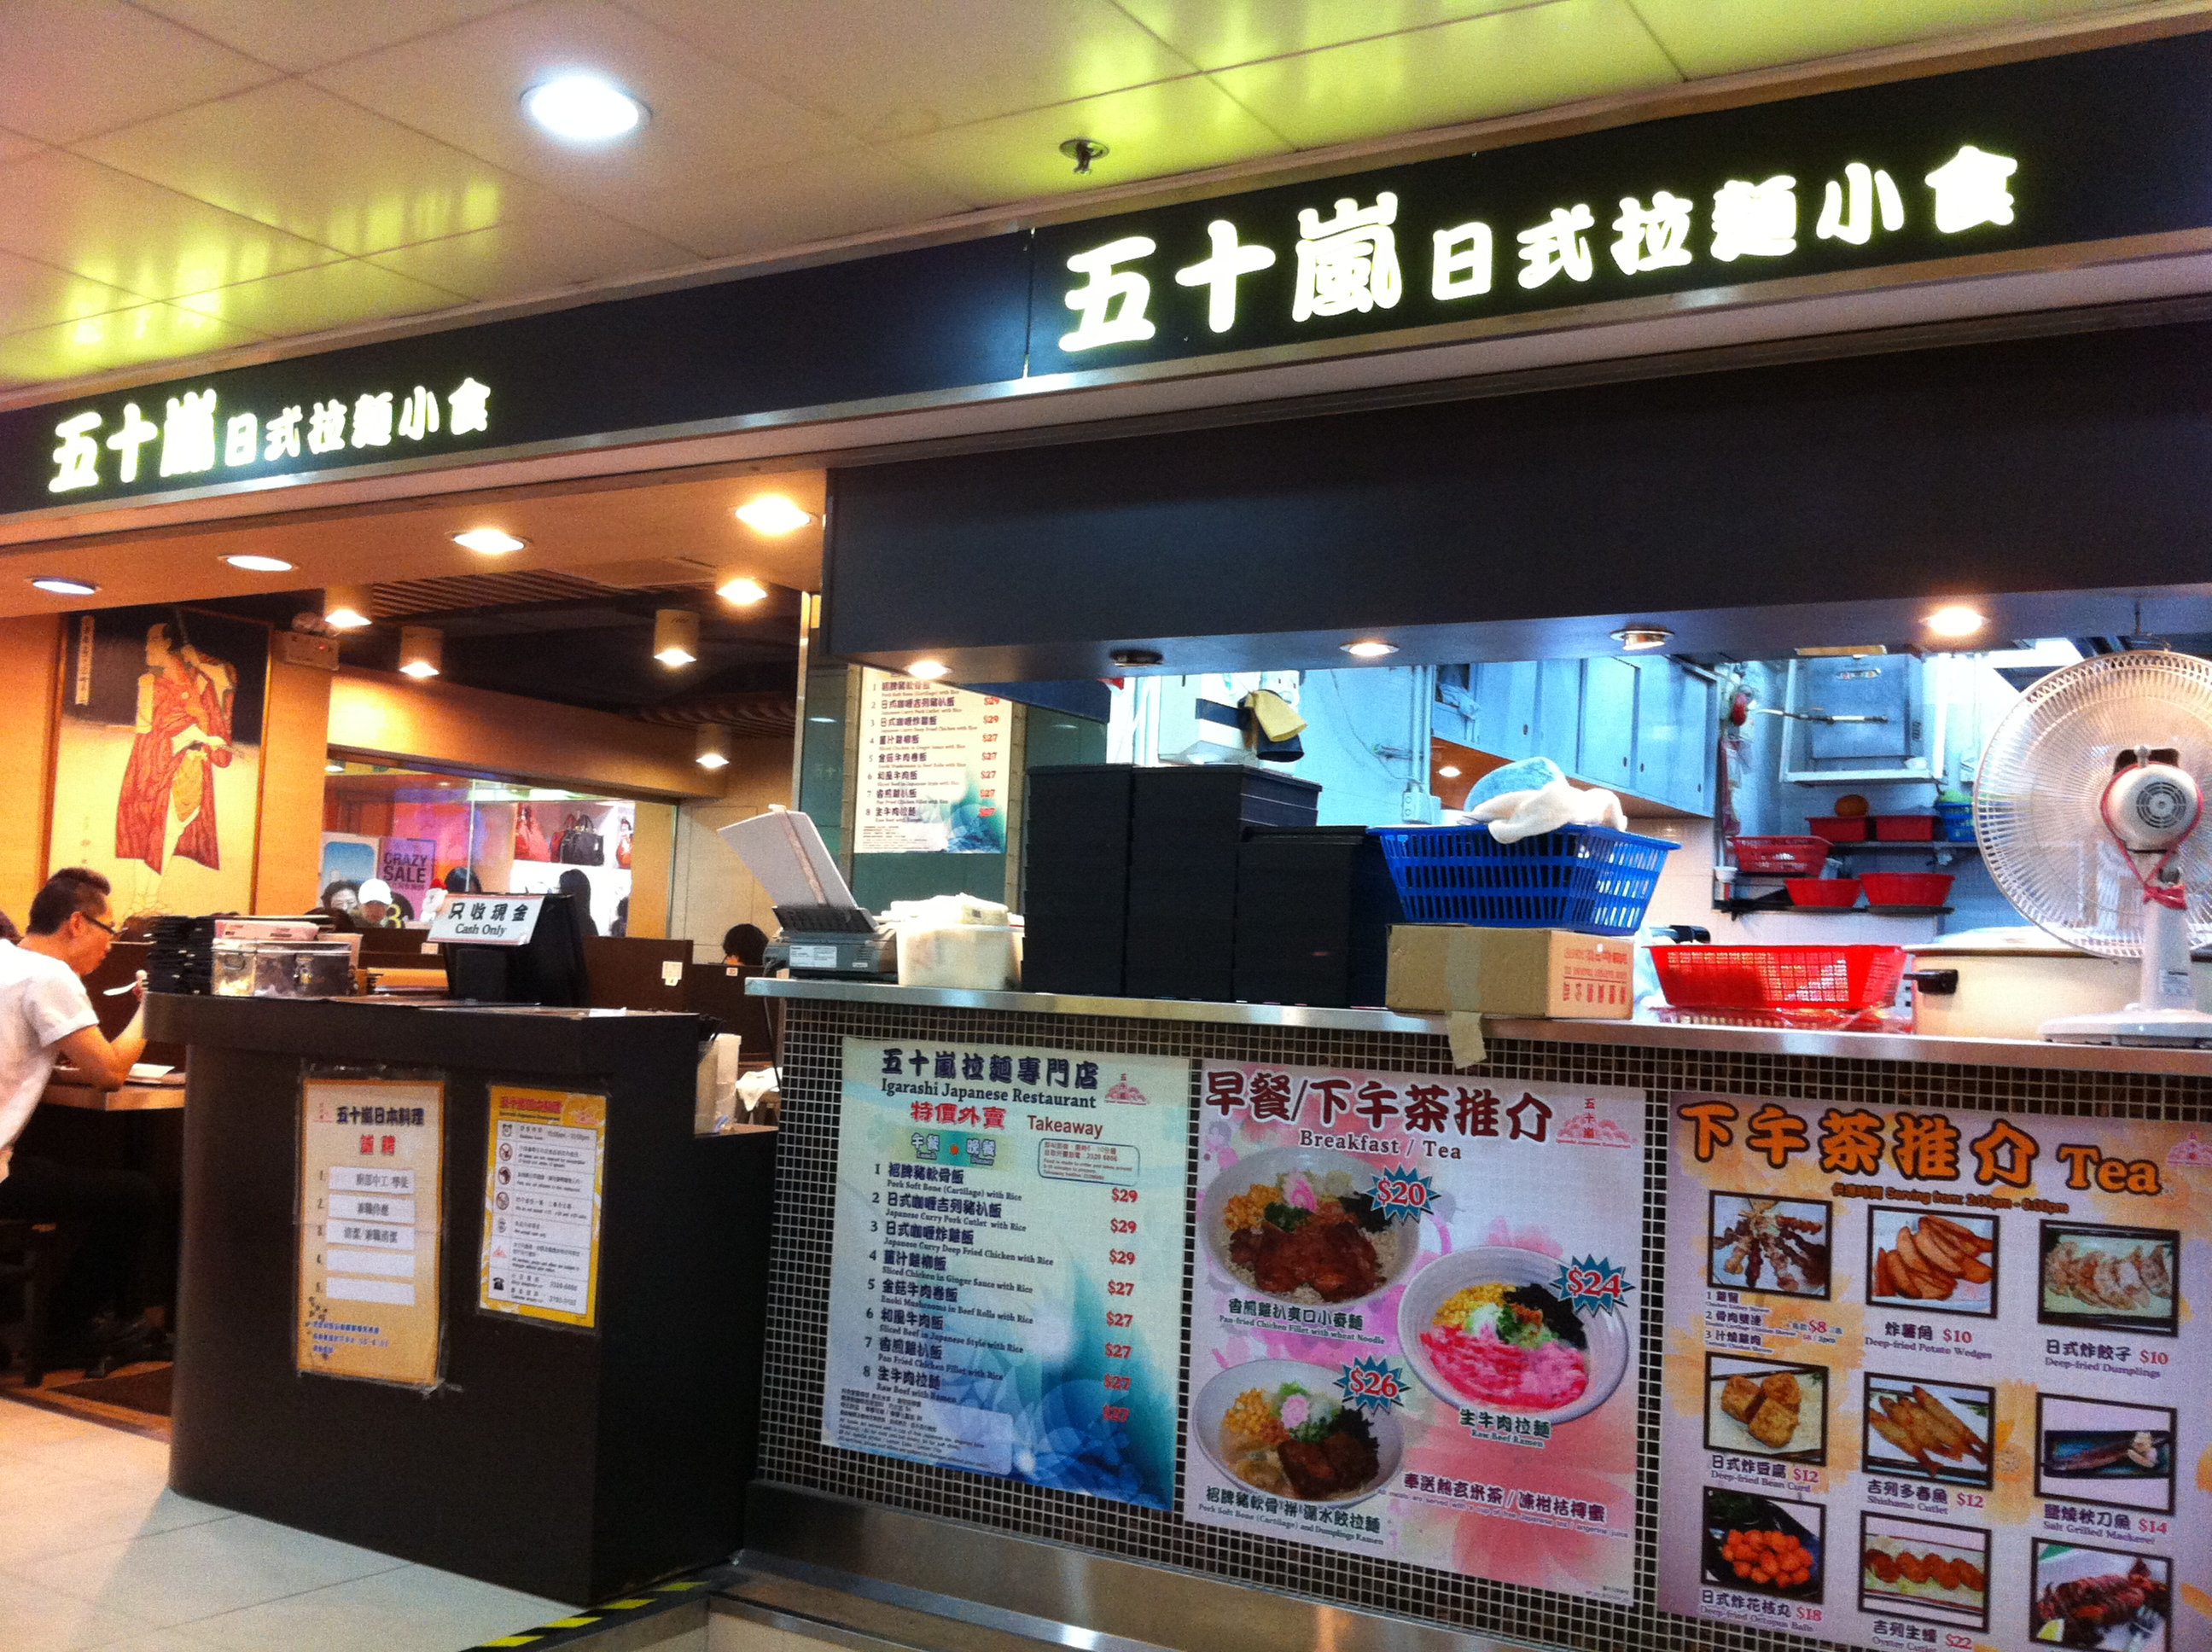 Japanese noodle shop owner fucked hard 8